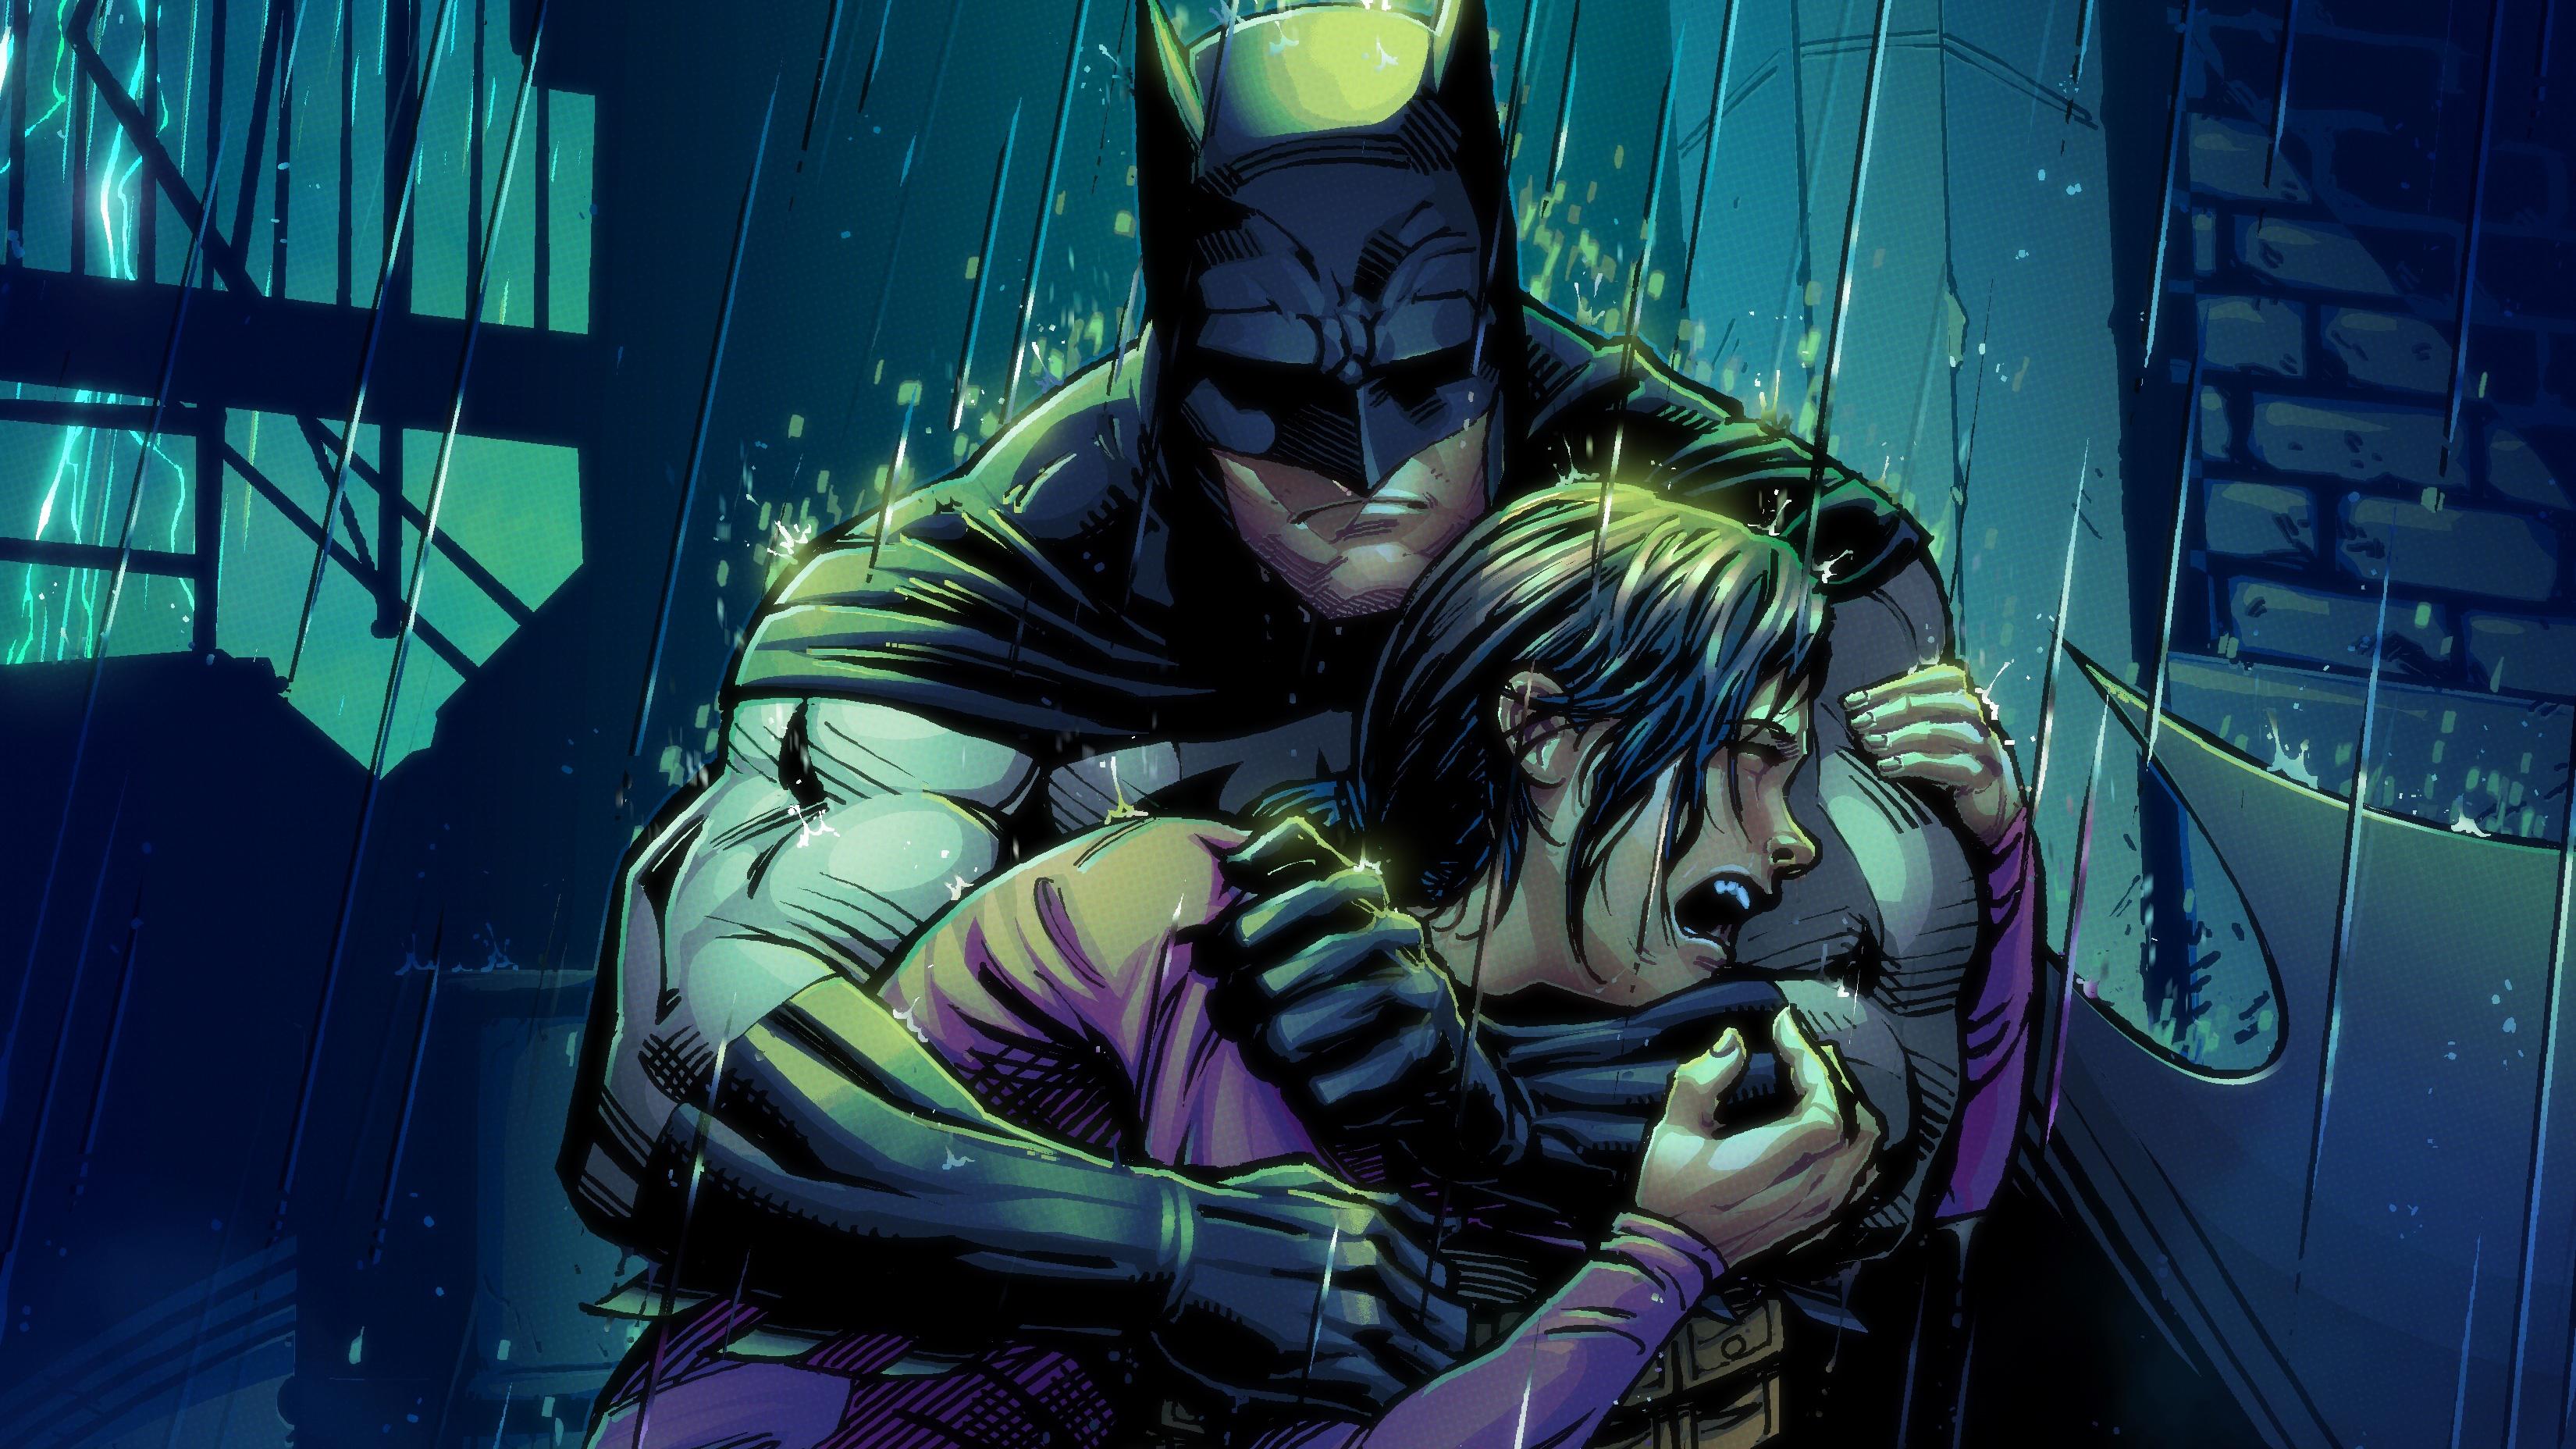 Robin Crying In Batman Arms, HD Superheroes, 4k Wallpapers ...